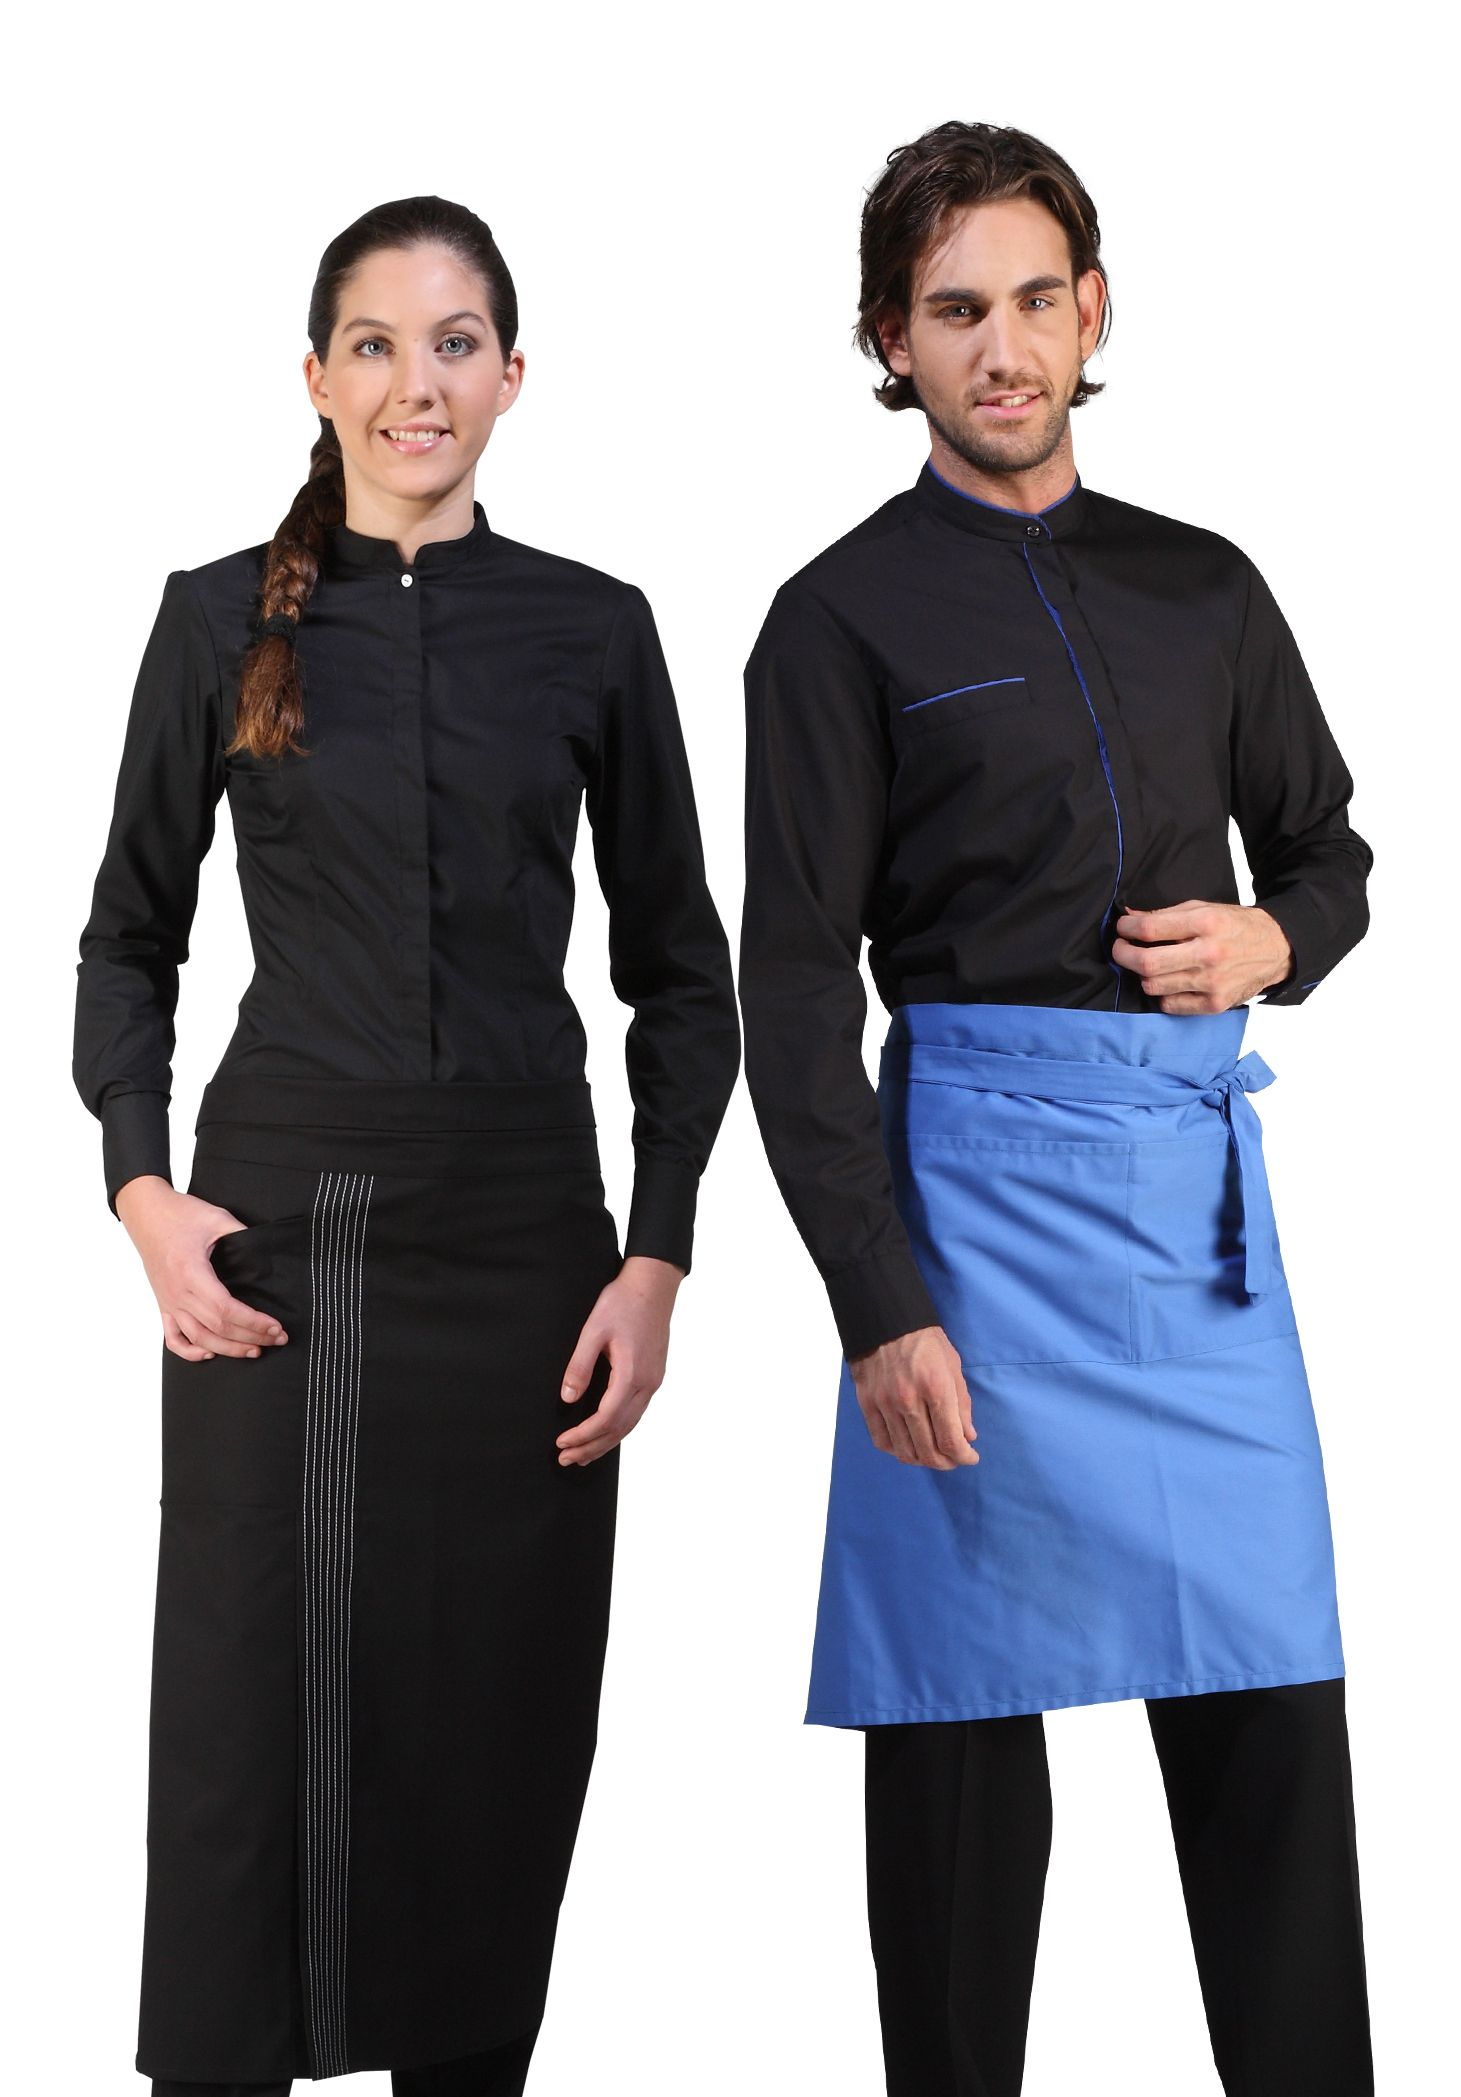 c816dddd947 Uniformes de Camarero @vittoriouniformes, ropa para su personal de sala de  Restaurante o Bar